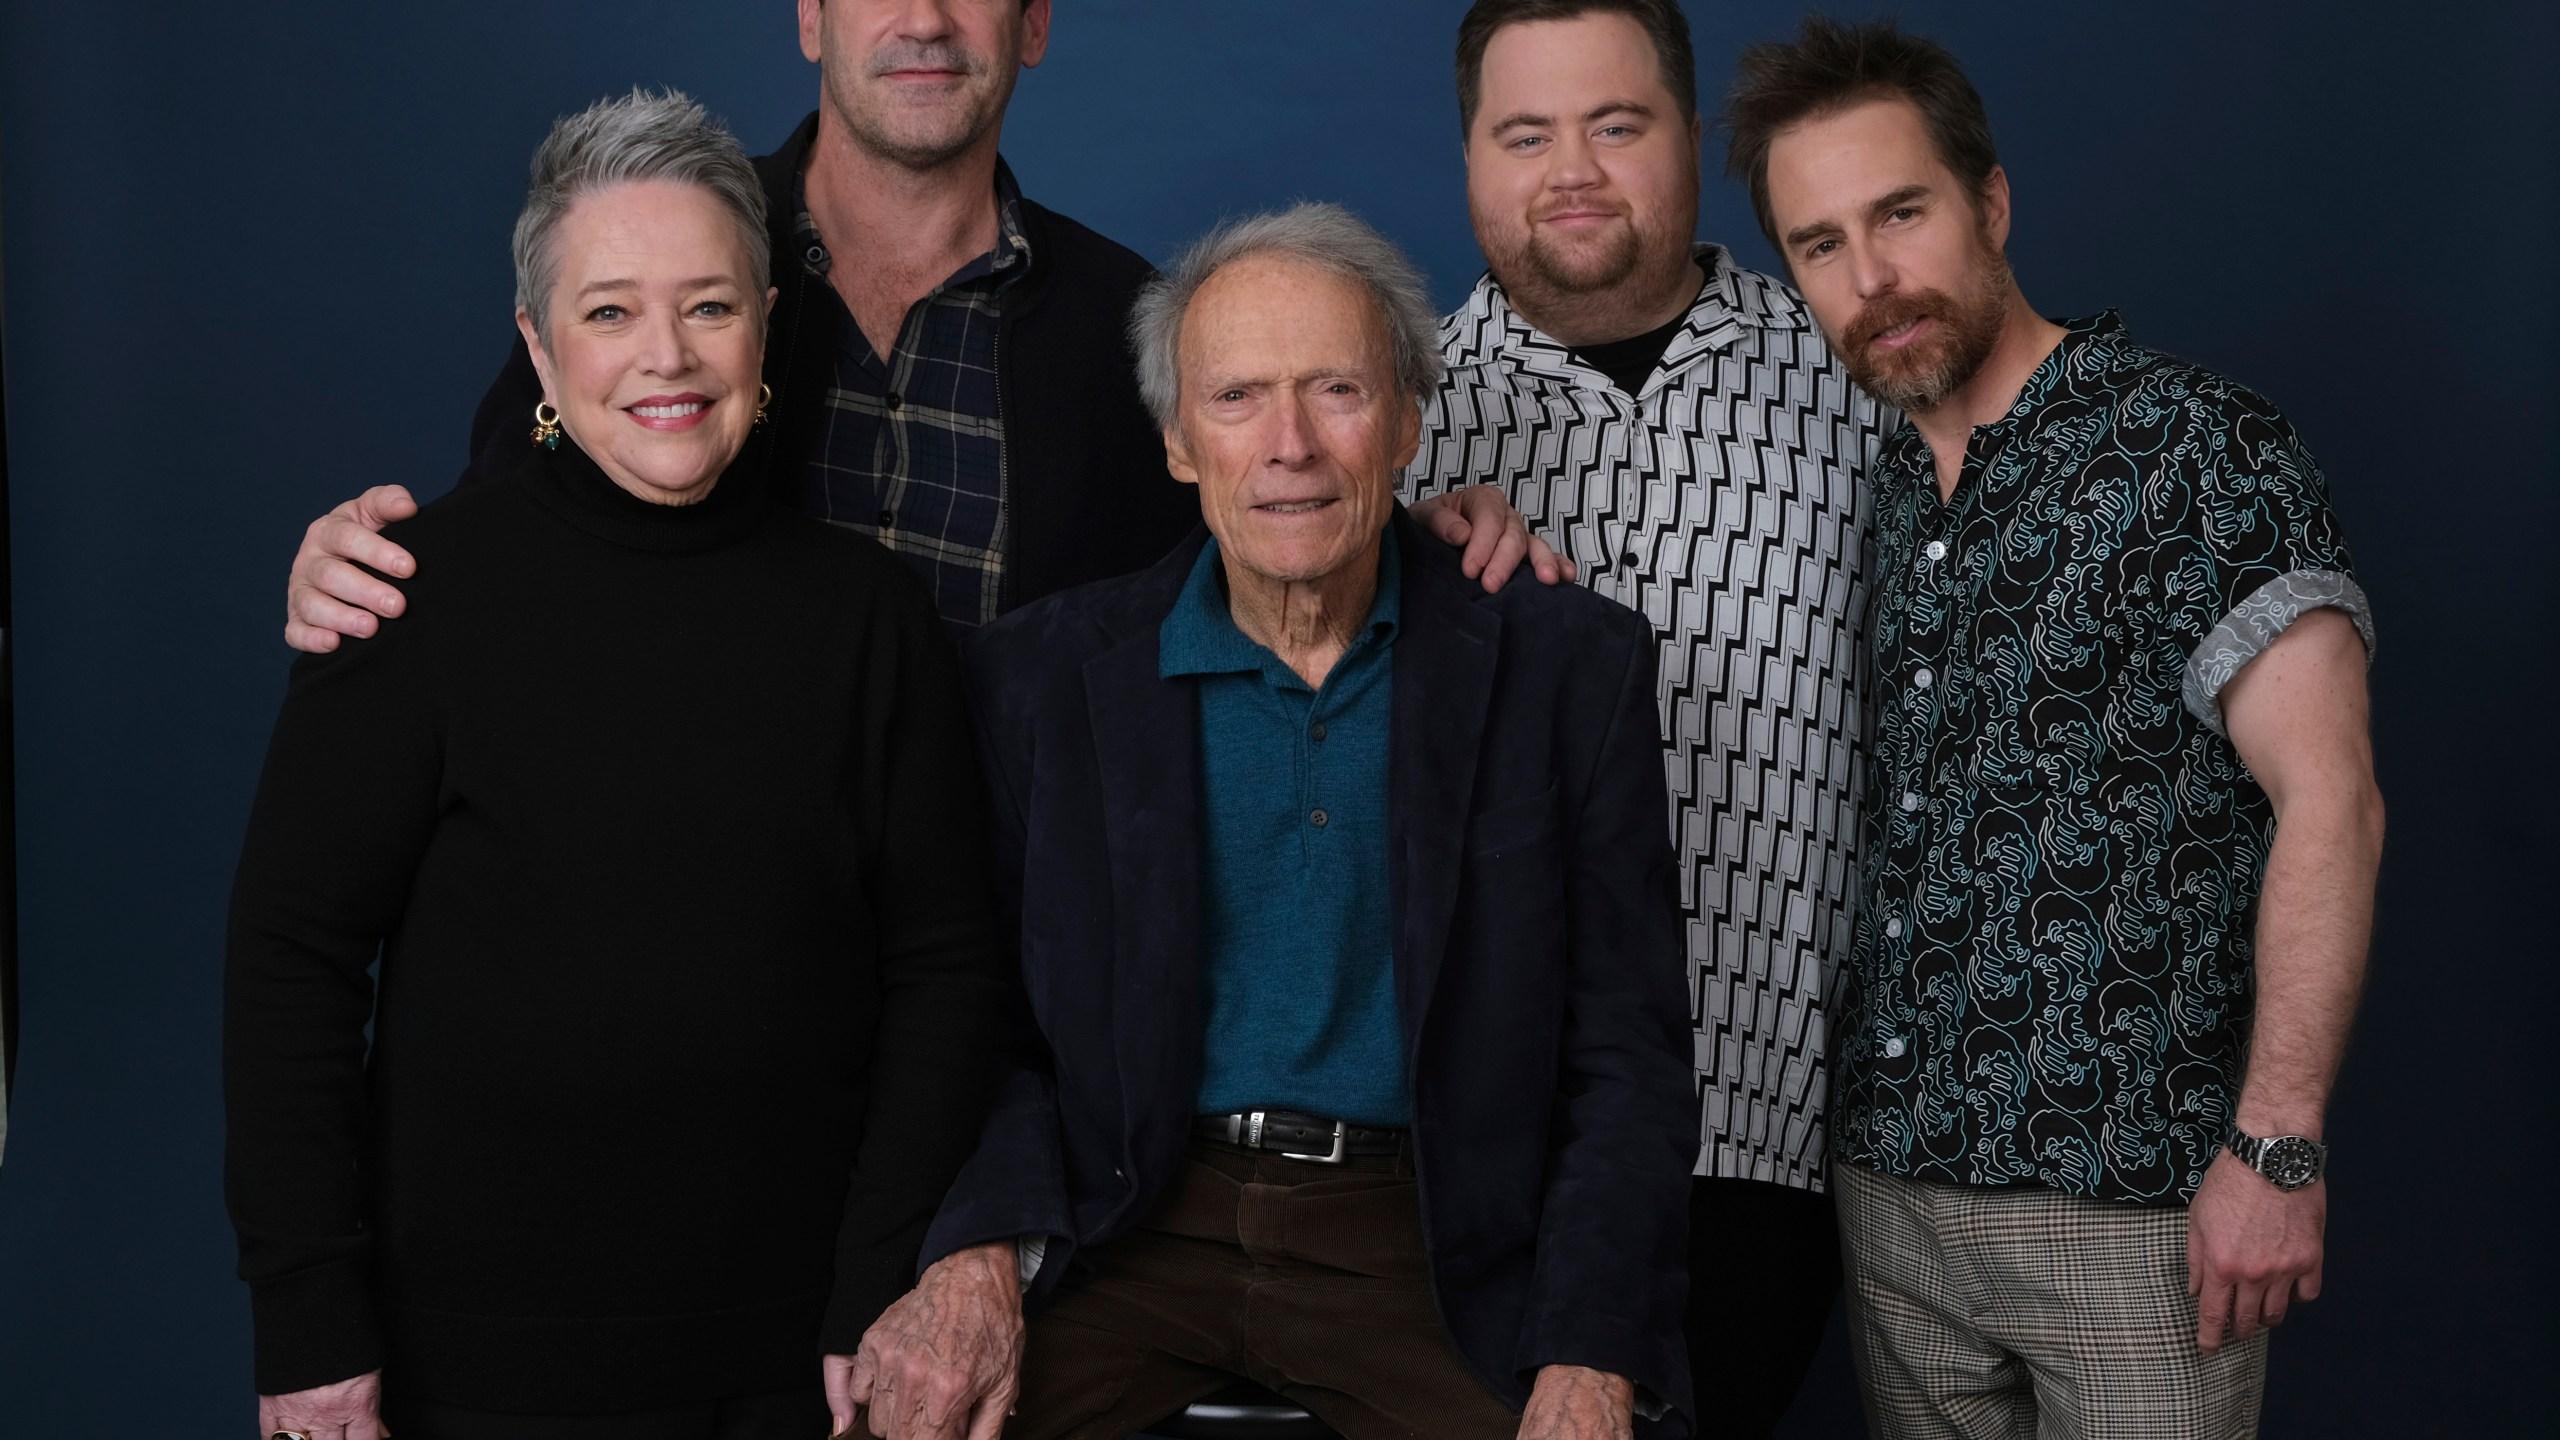 Clint Eastwood, Kathy Bates, Sam Rockwell, Paul Walter Hauser, Jon Hamm